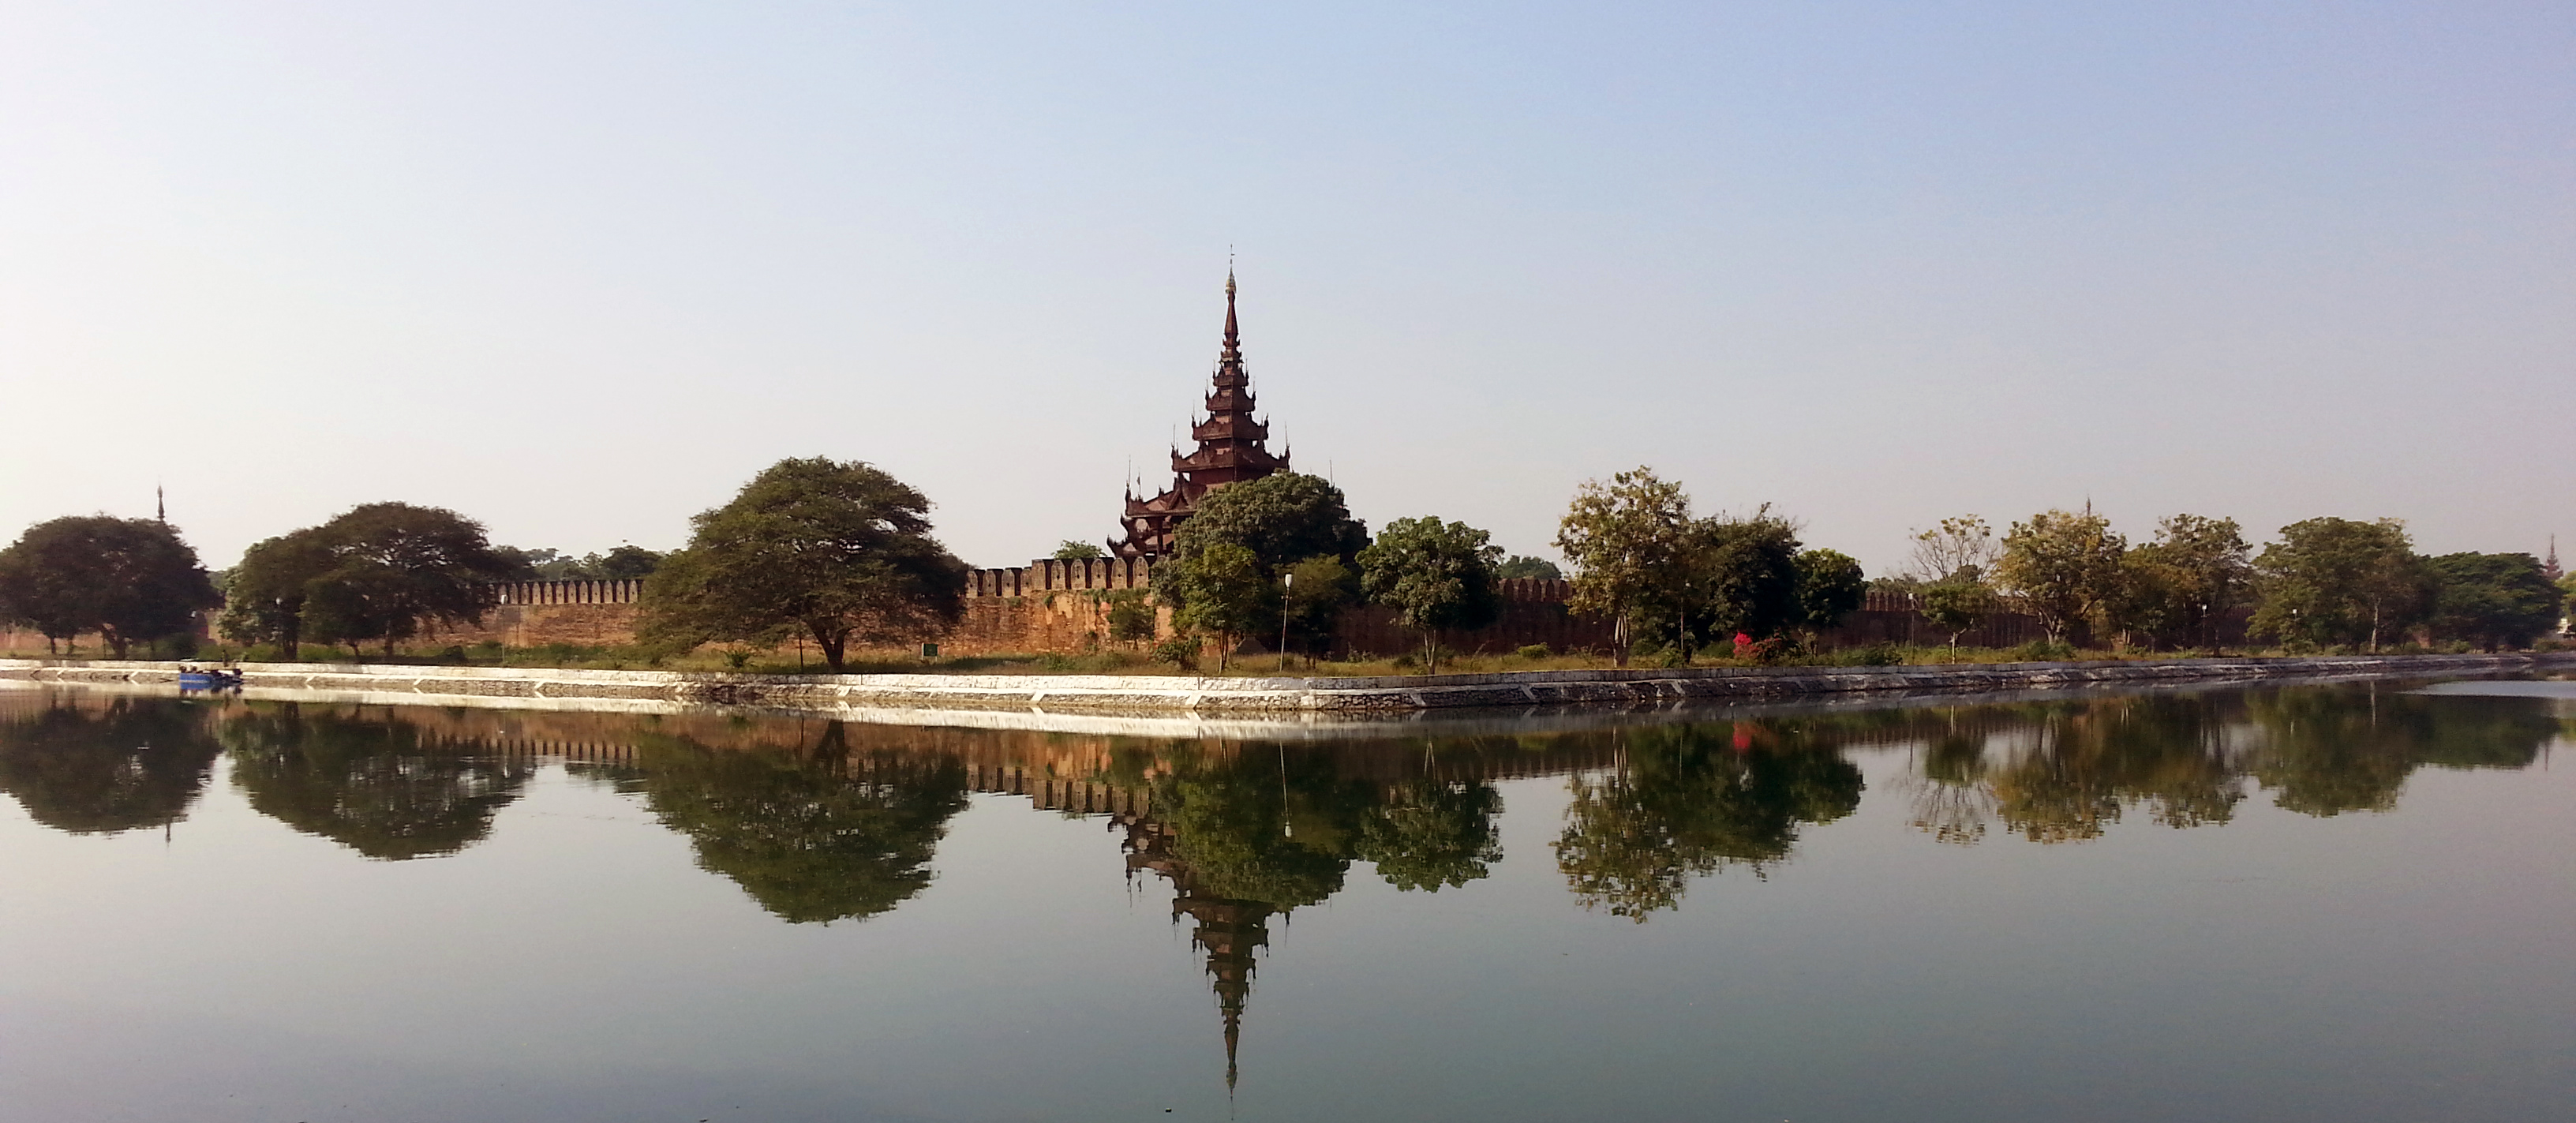 Mya Nan San Kyaw, last Royal Burmese palace